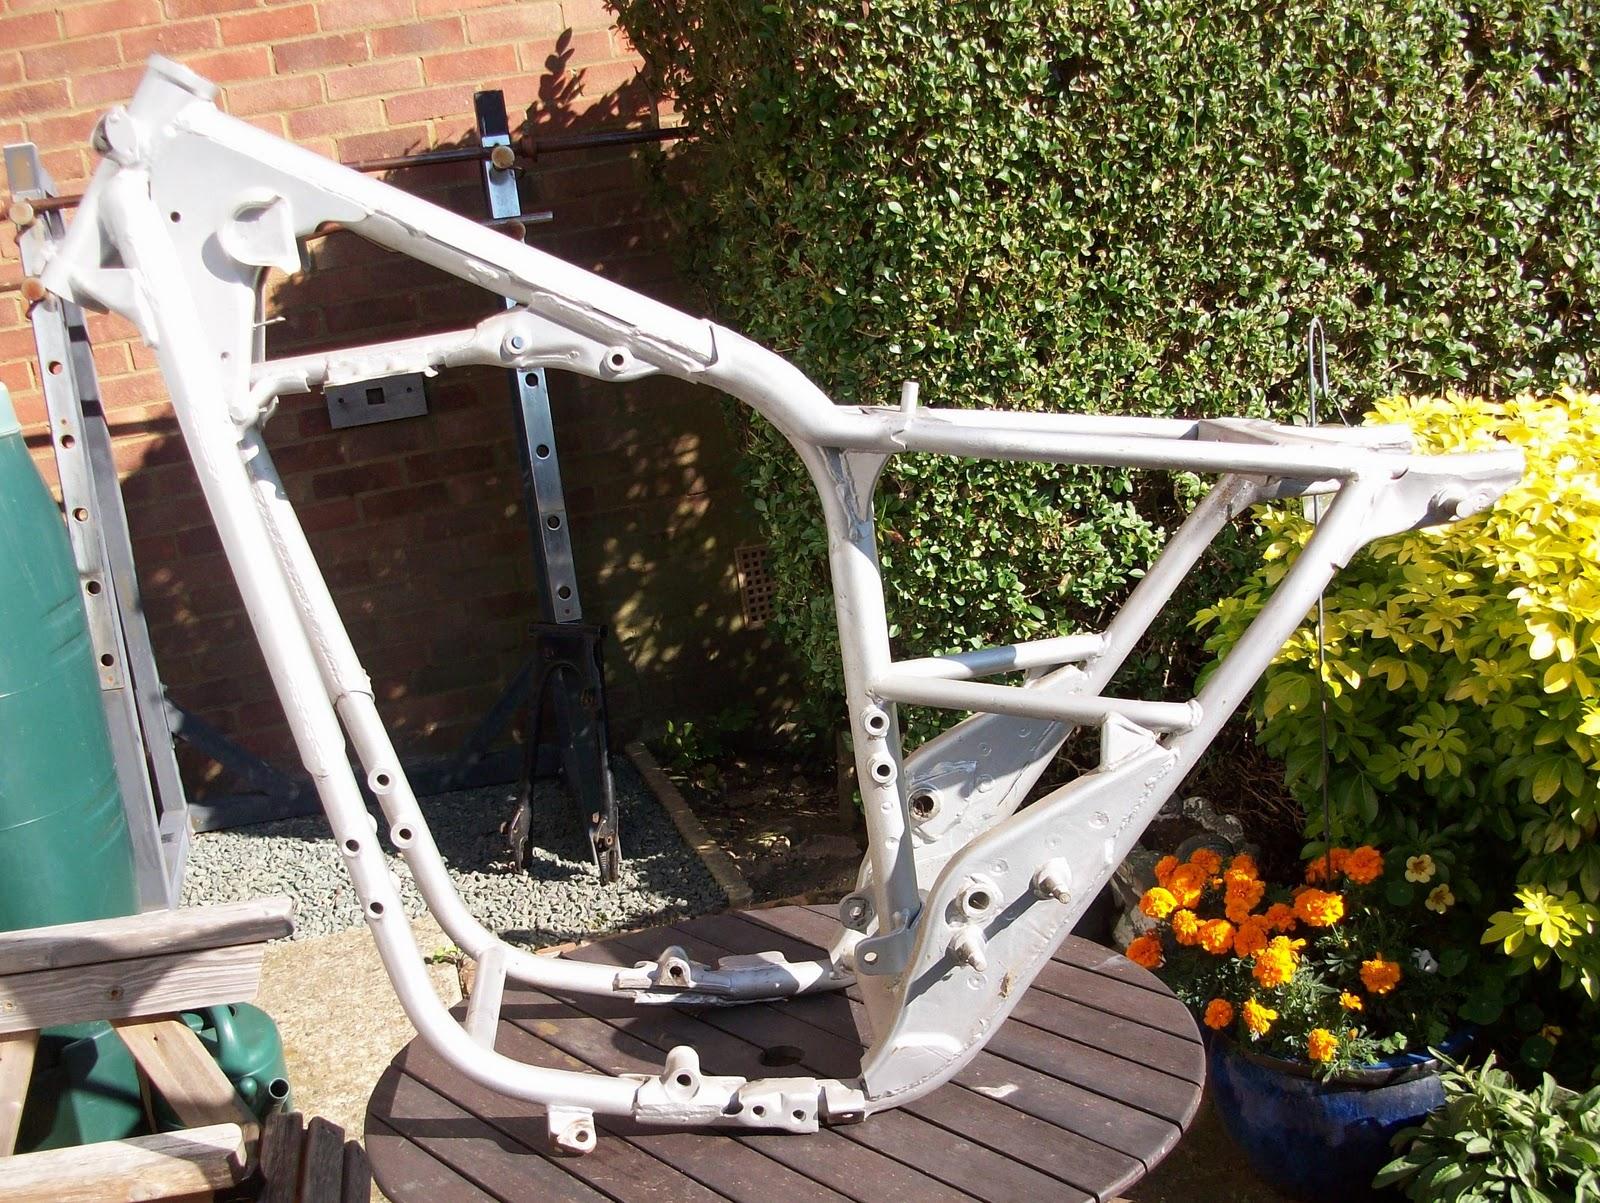 XS650 Bobber Build: Frame alterations